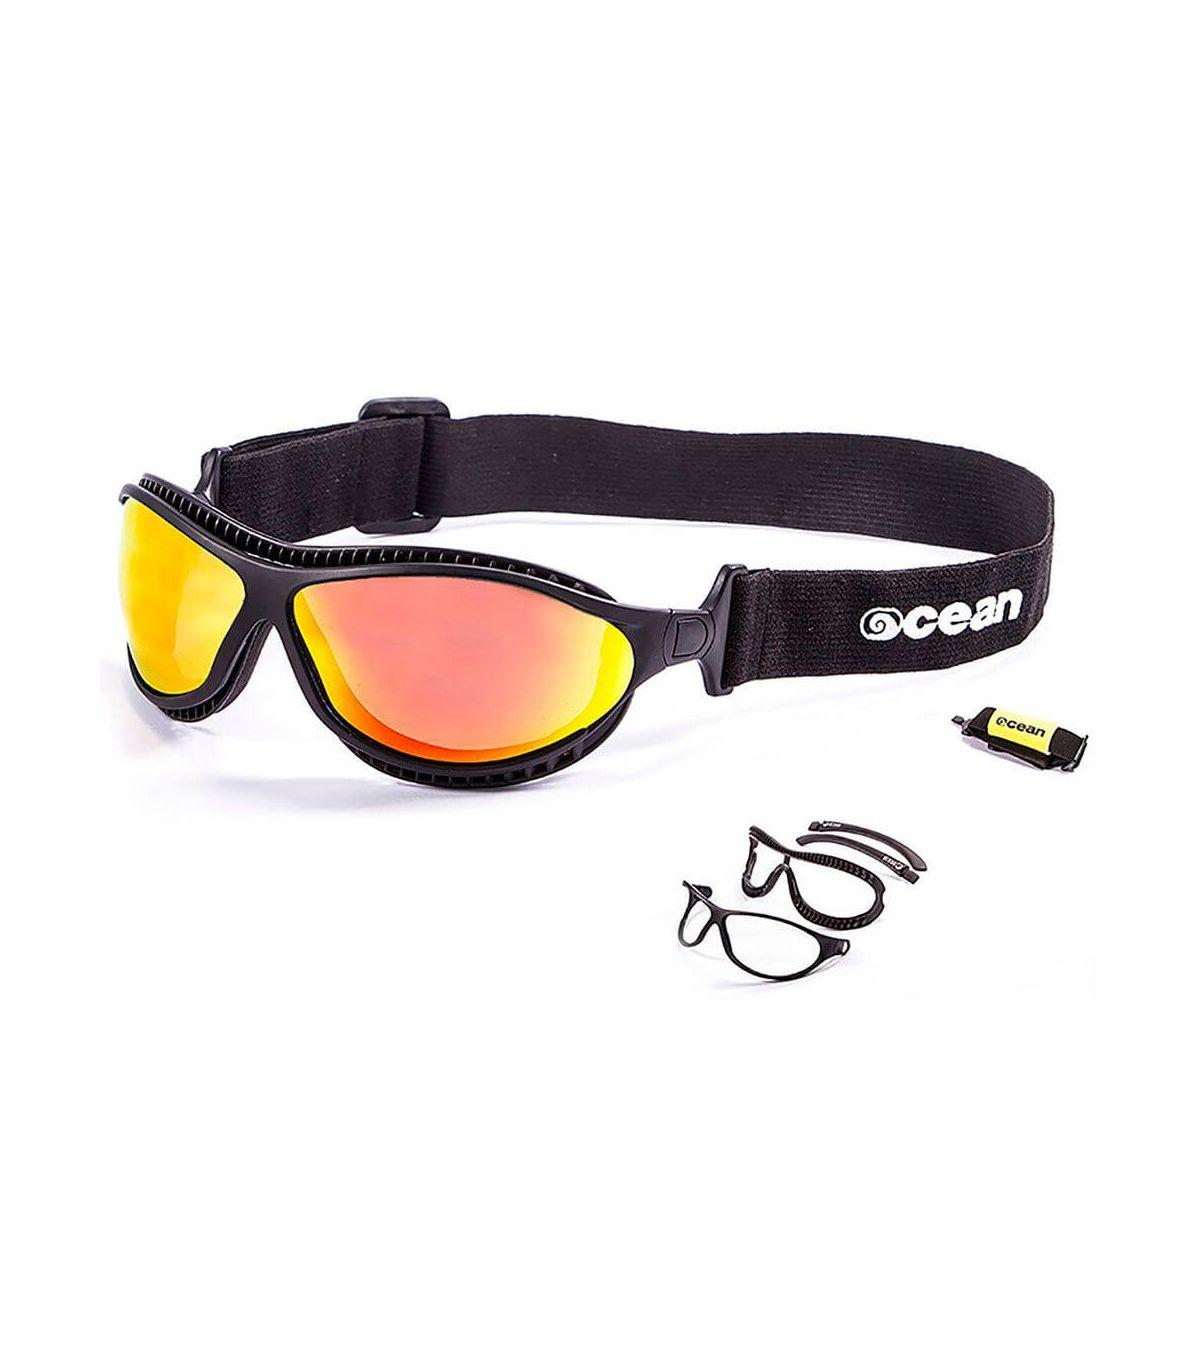 Ocean Tierra de Fuego Mate Black / Revo Ocean Sunglasses Gafas de sol Running Running Color: negro